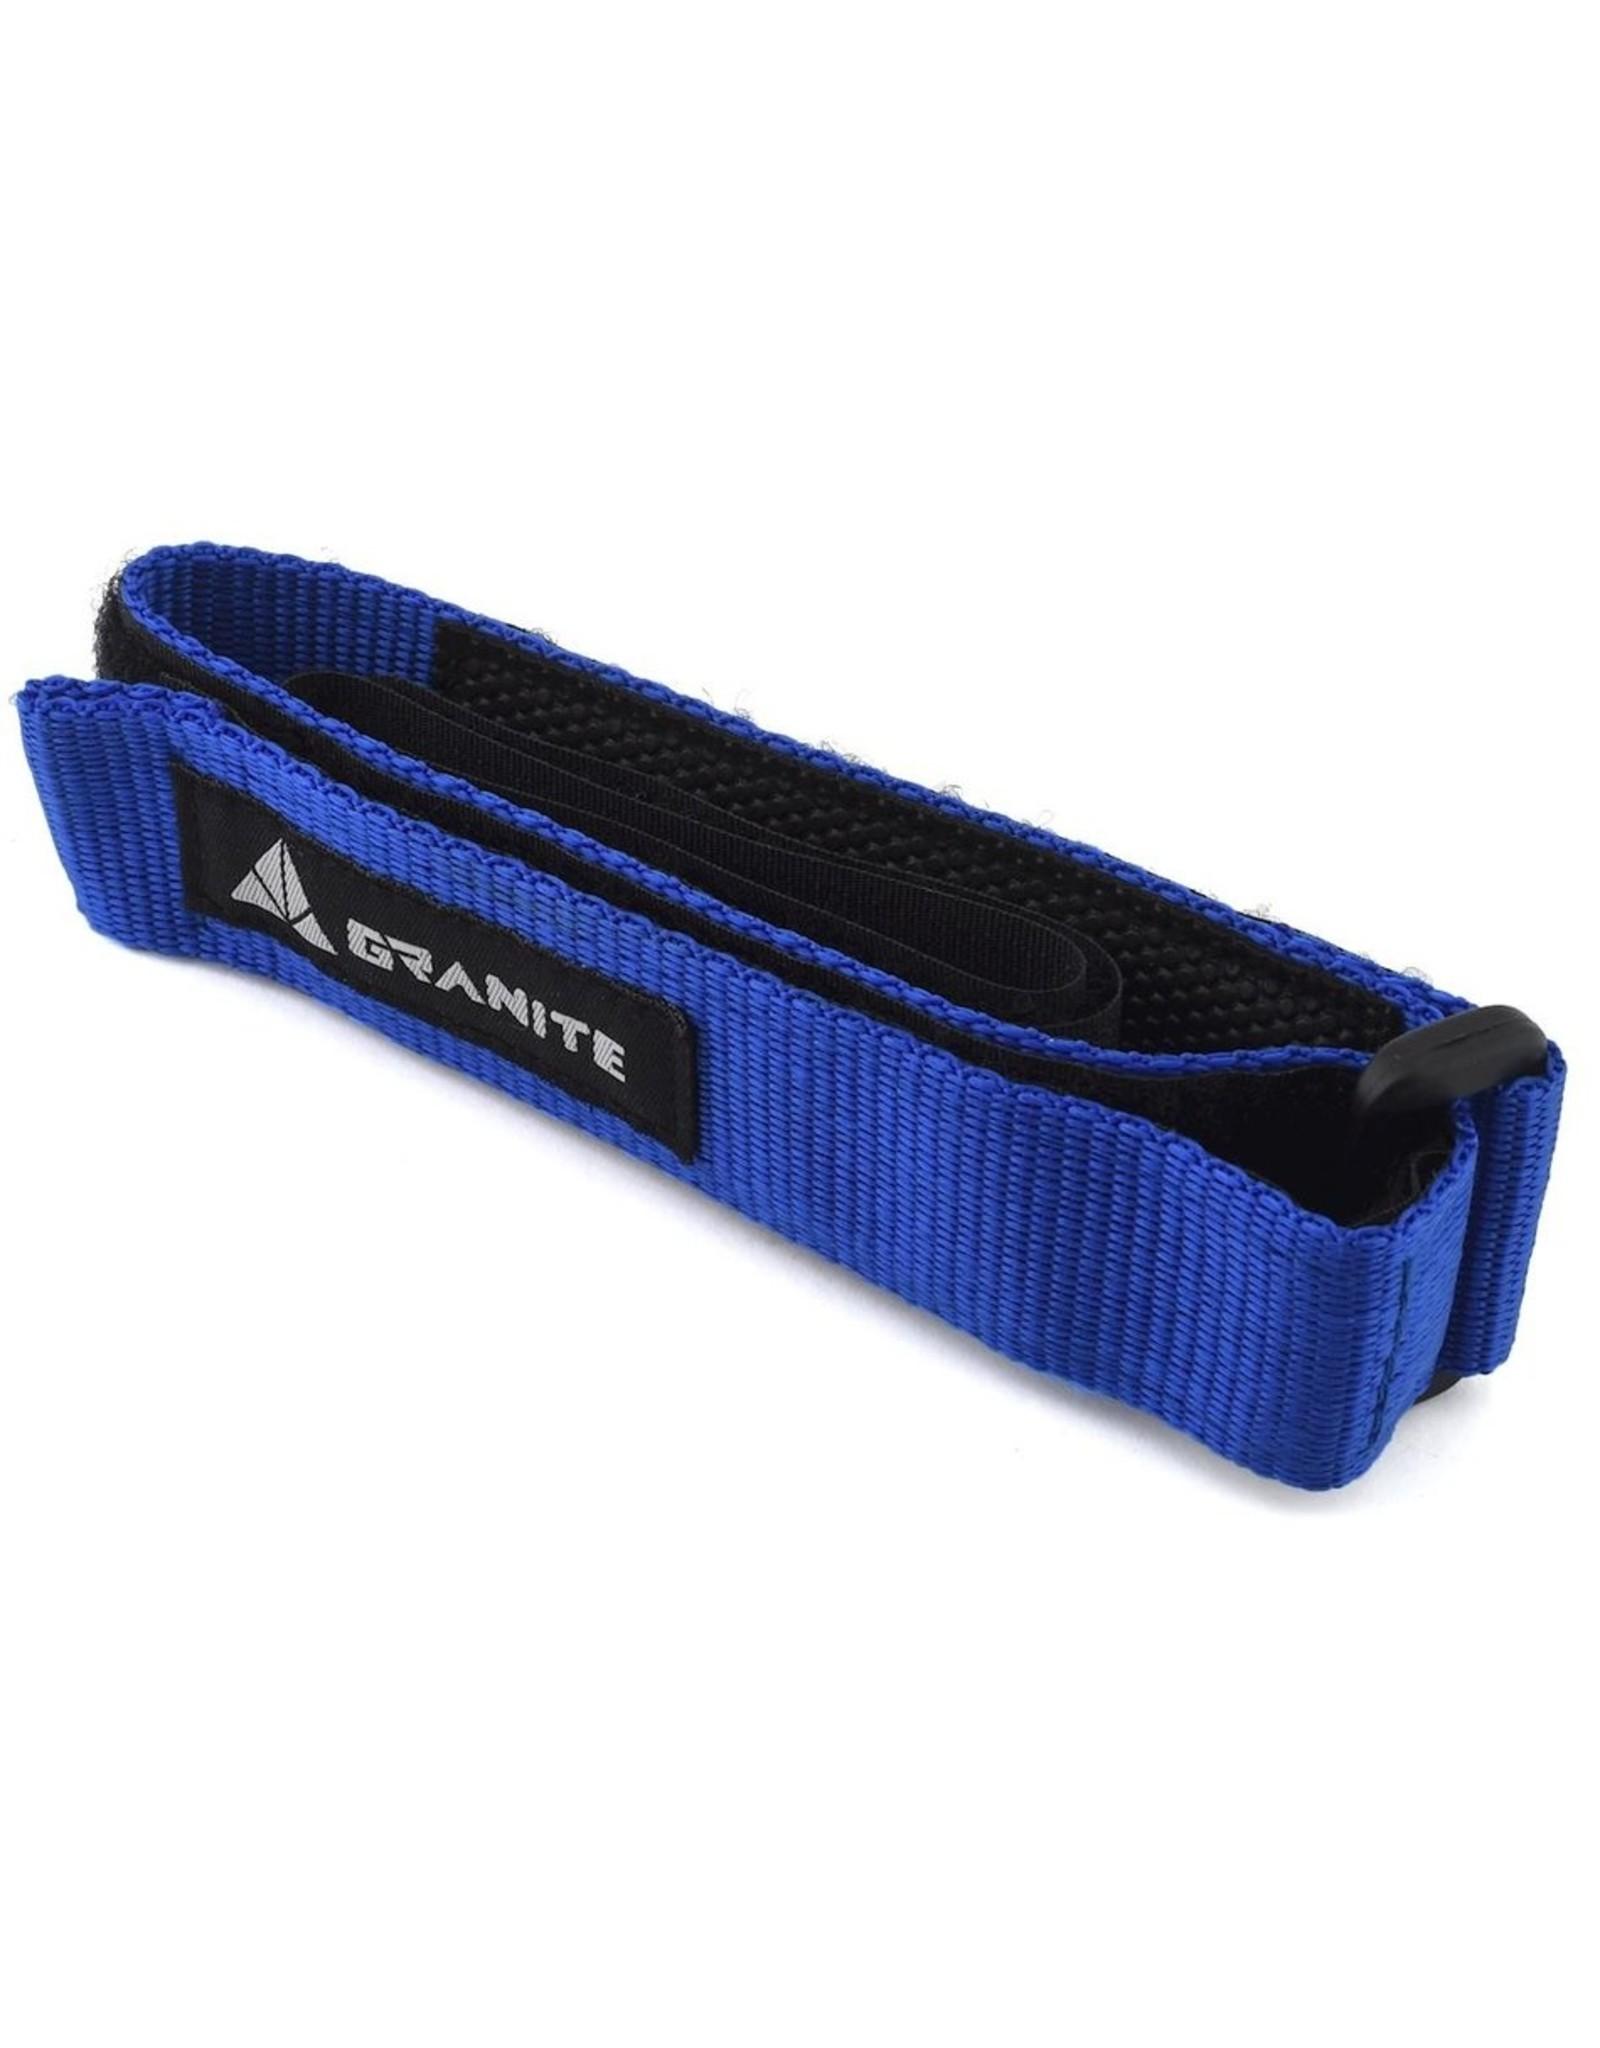 Granite-Design Rockband, Blue